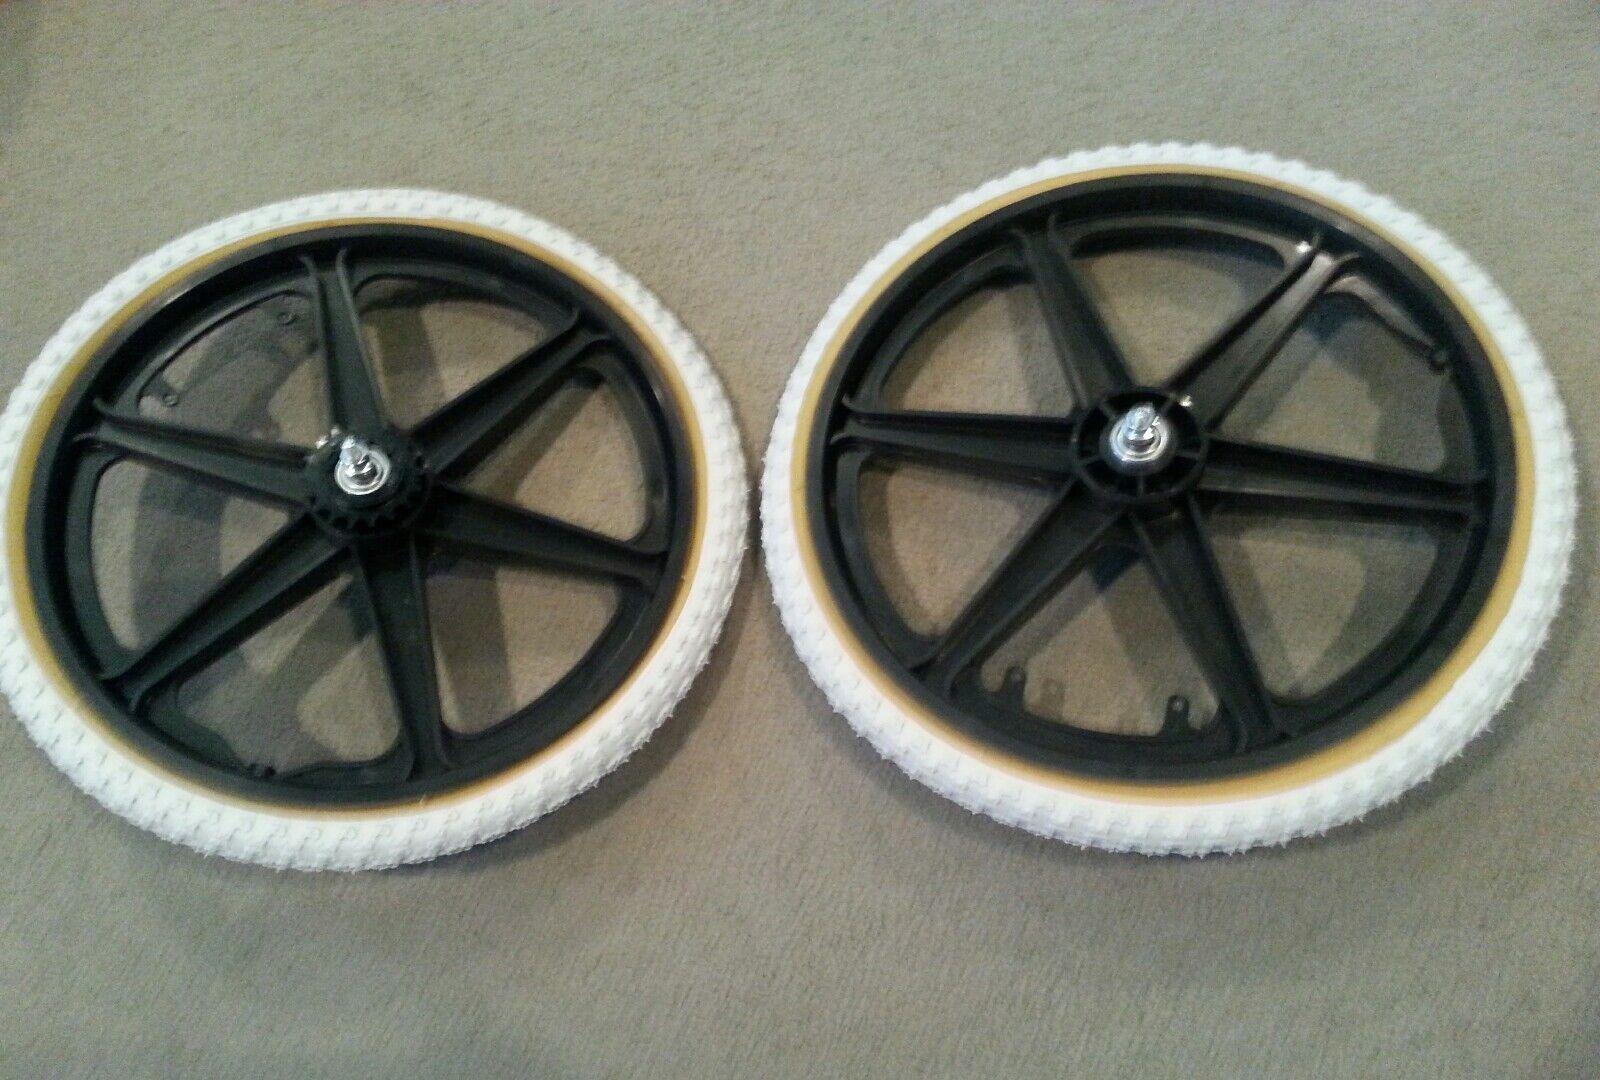 Nuevo 20  MAG Ruedas de 6 radios blancoo Neumáticos Tubos Para Gt Dyno Haro o BMX Bicicletas